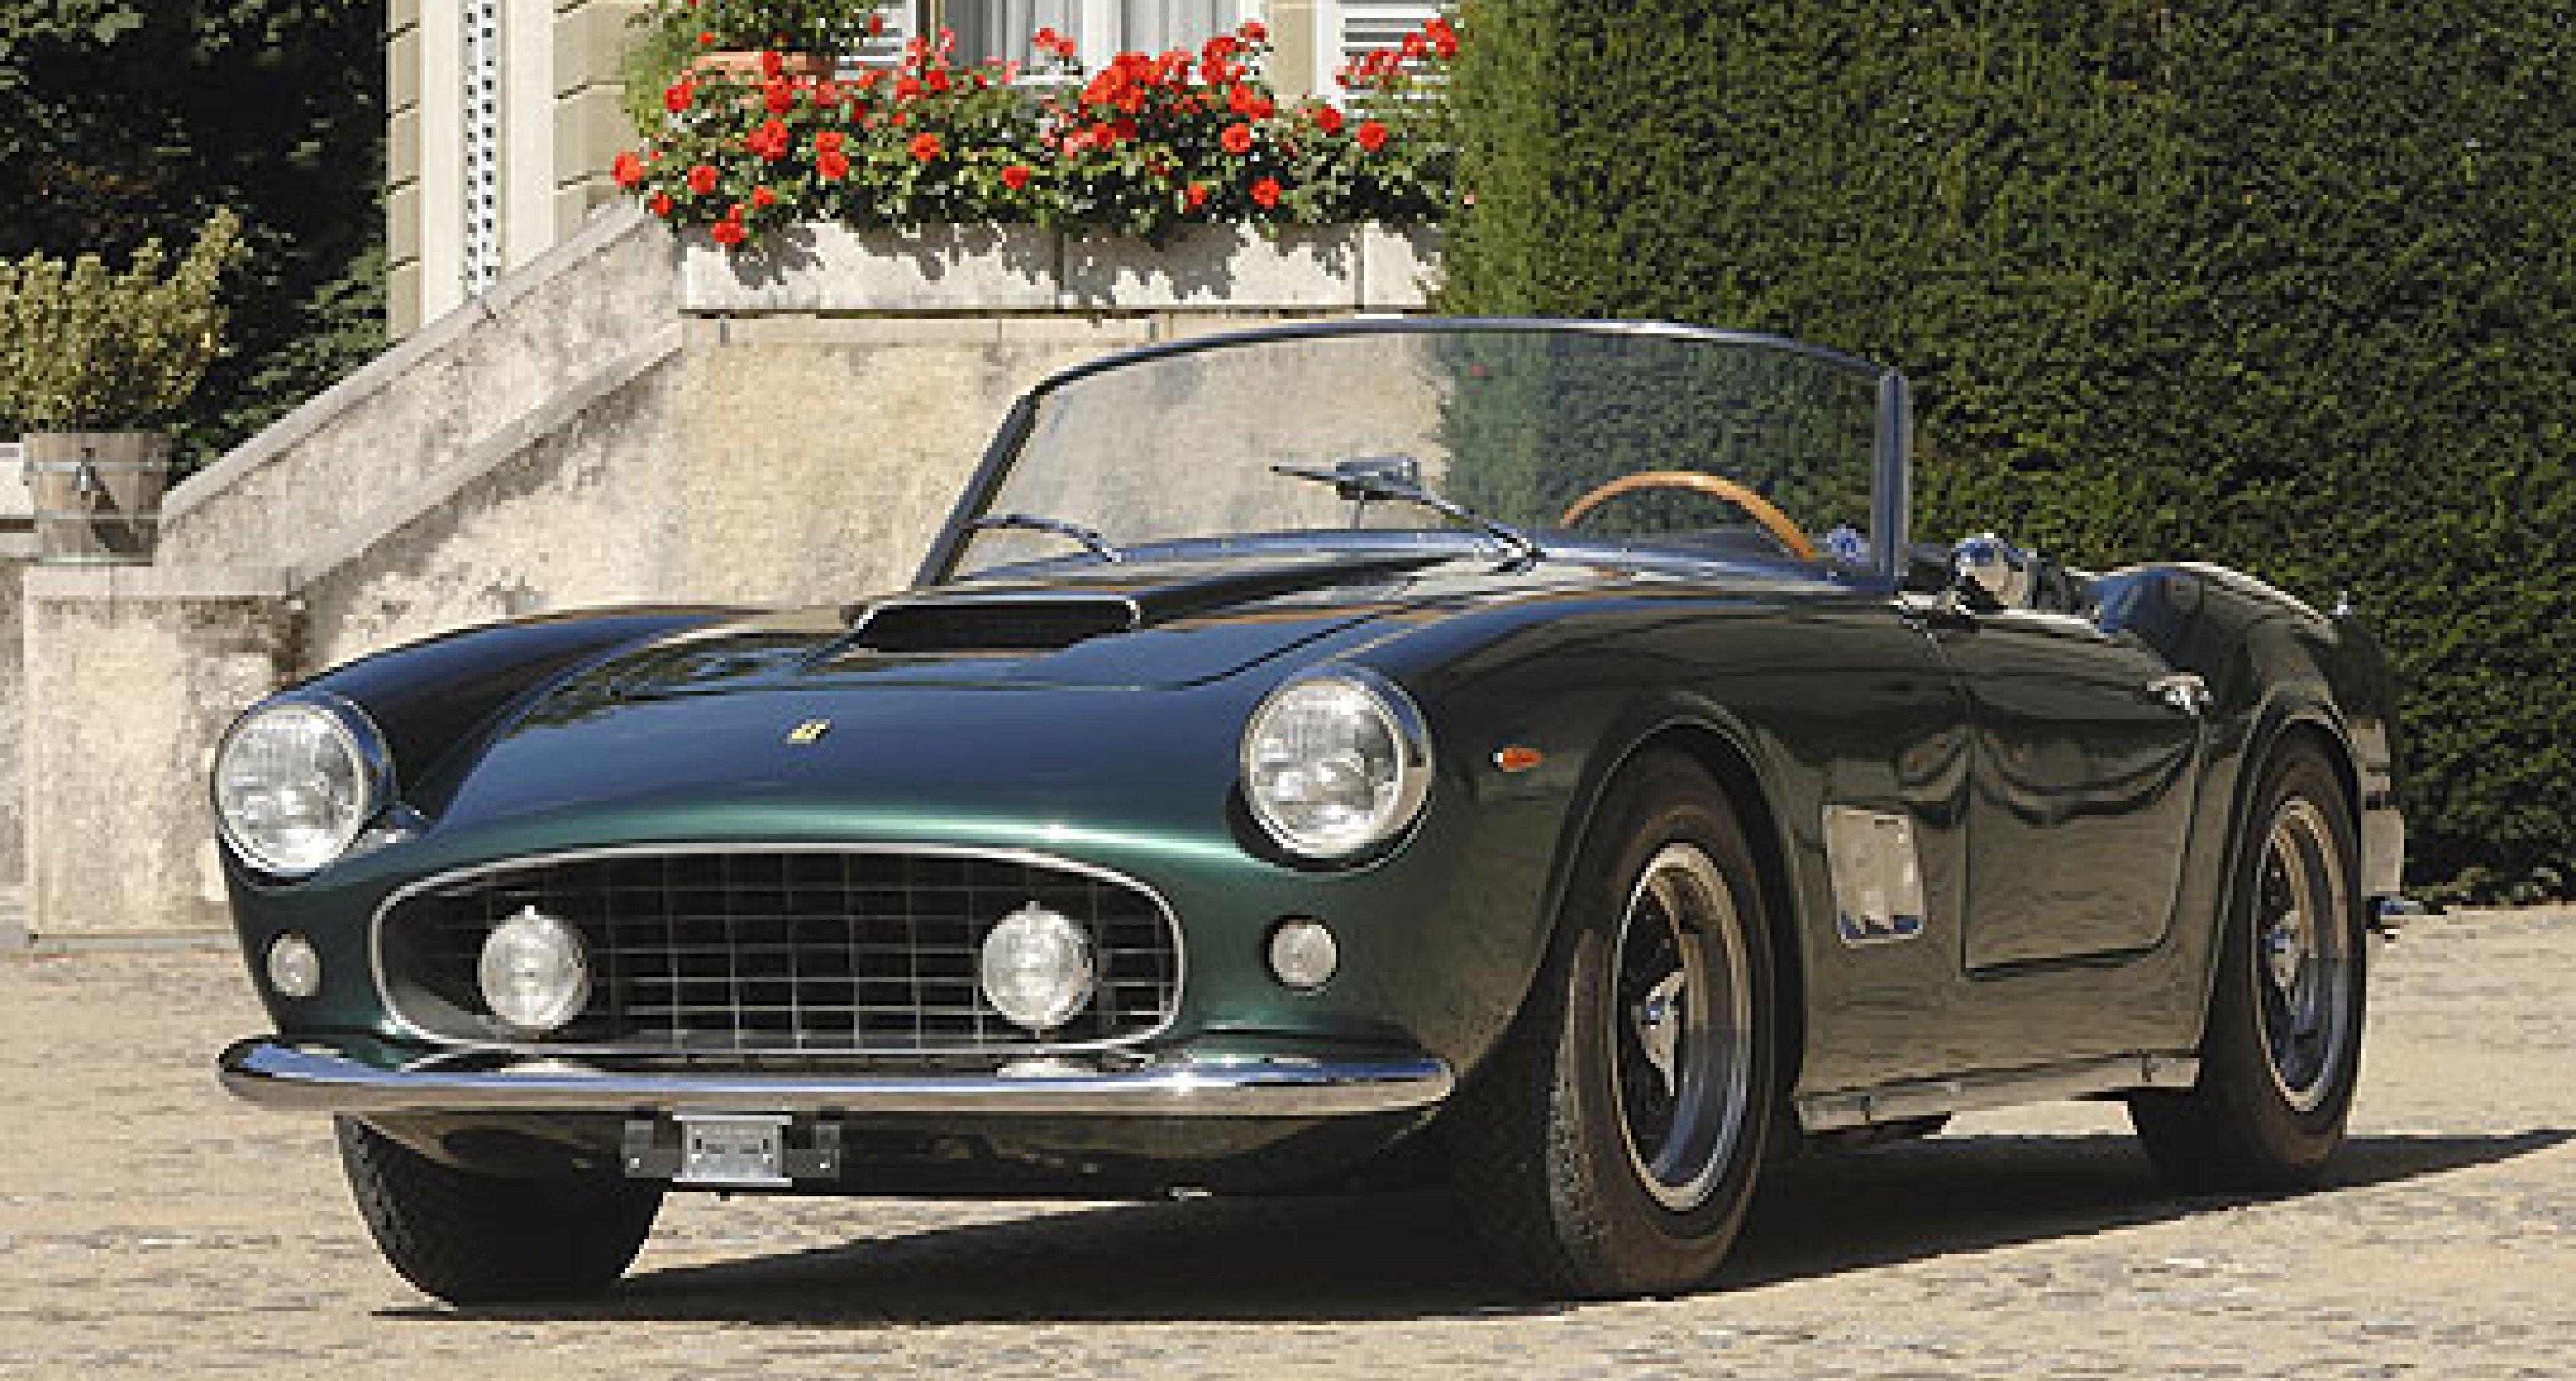 Spyder California and F40 – three decades of Ferrari brilliance